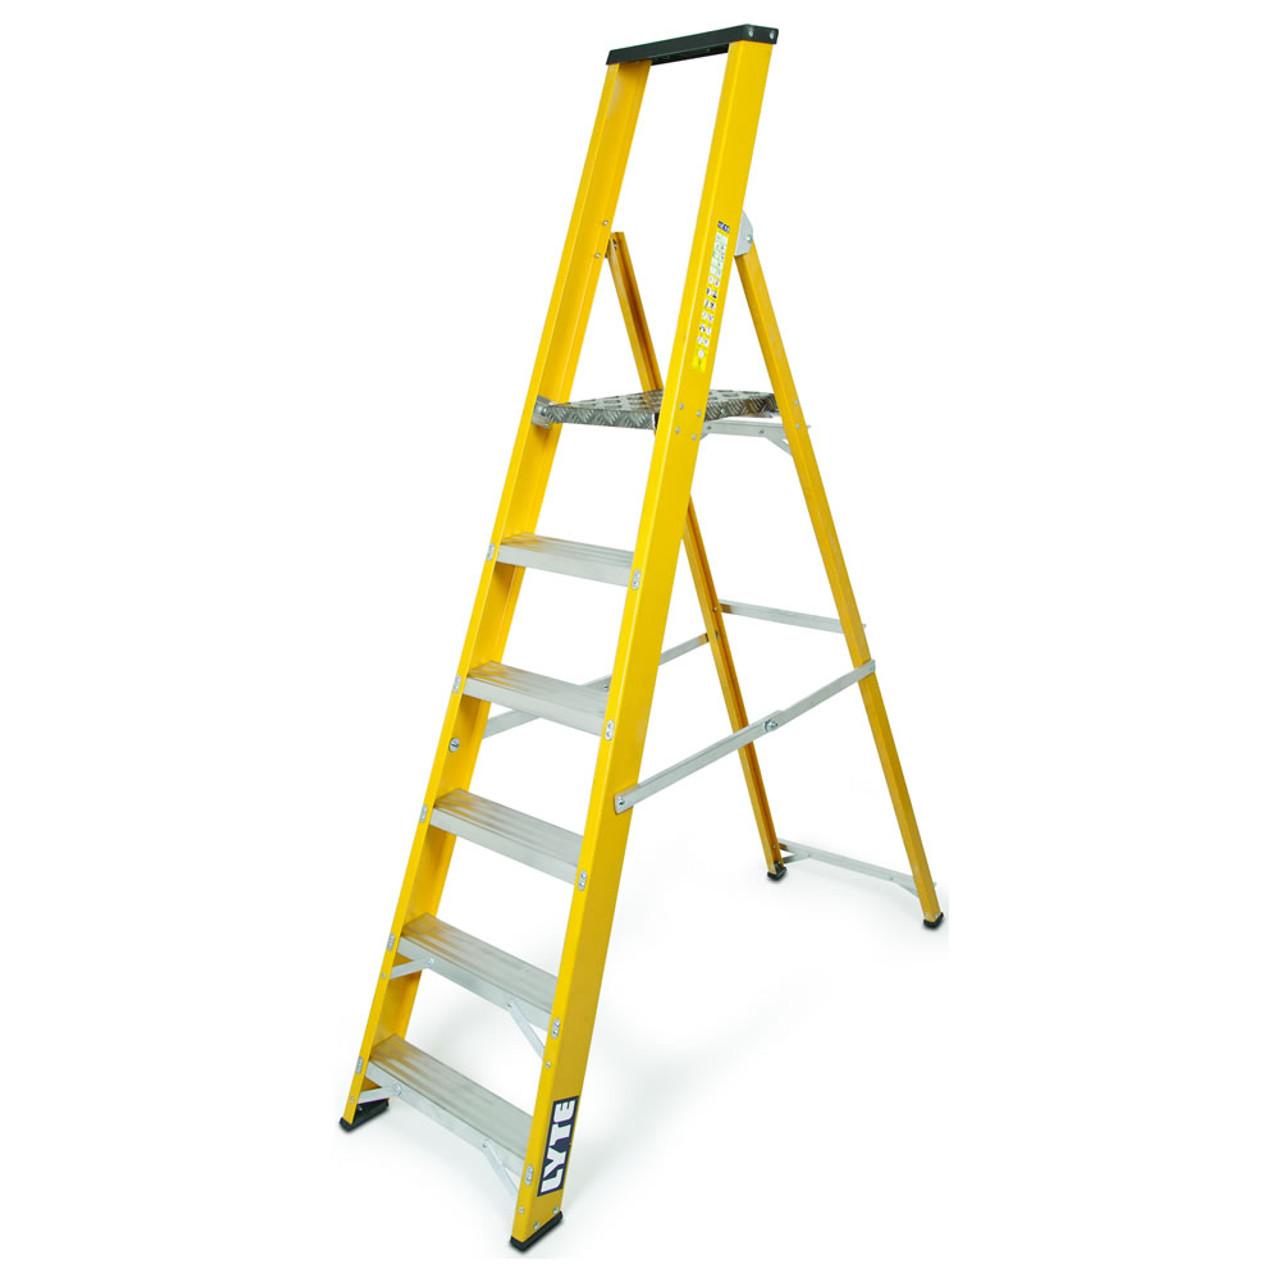 Lyte 6-Tread High Quality British Made Glassfibre Swingback Step Ladder